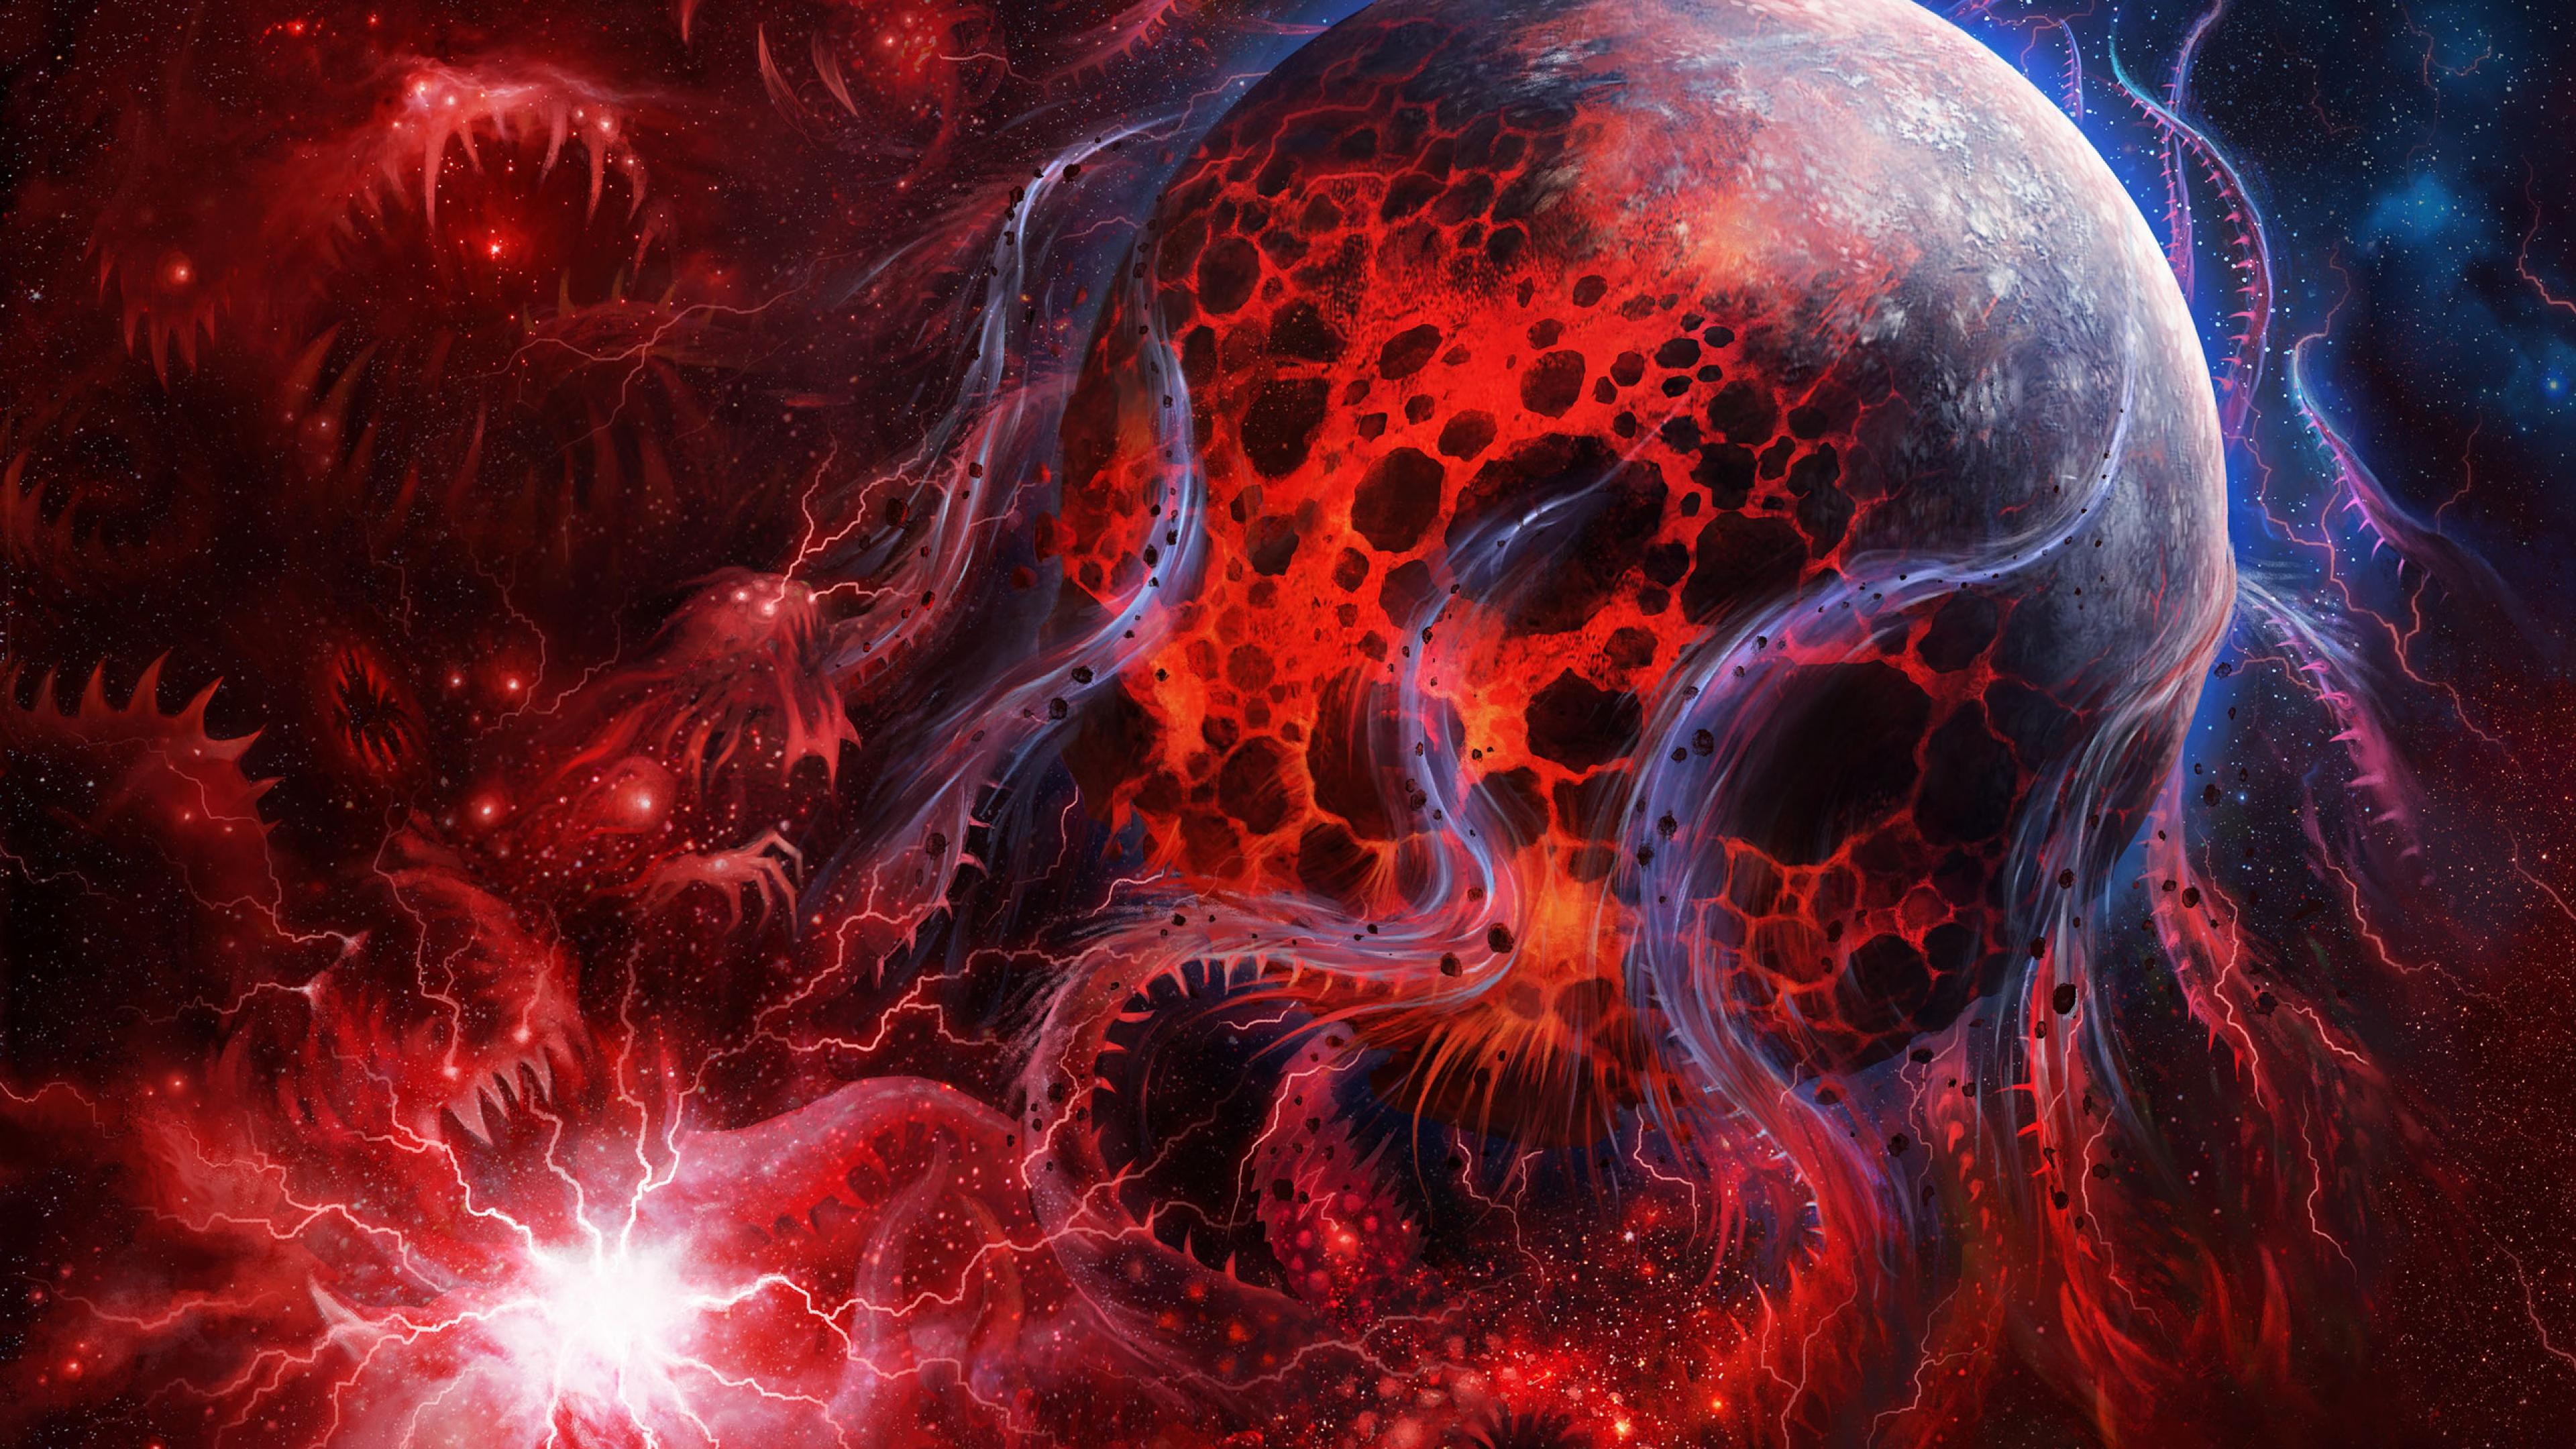 Space Art Abstract Design Red Planet Fire Wallpaper WallpapersByte 3840x2160